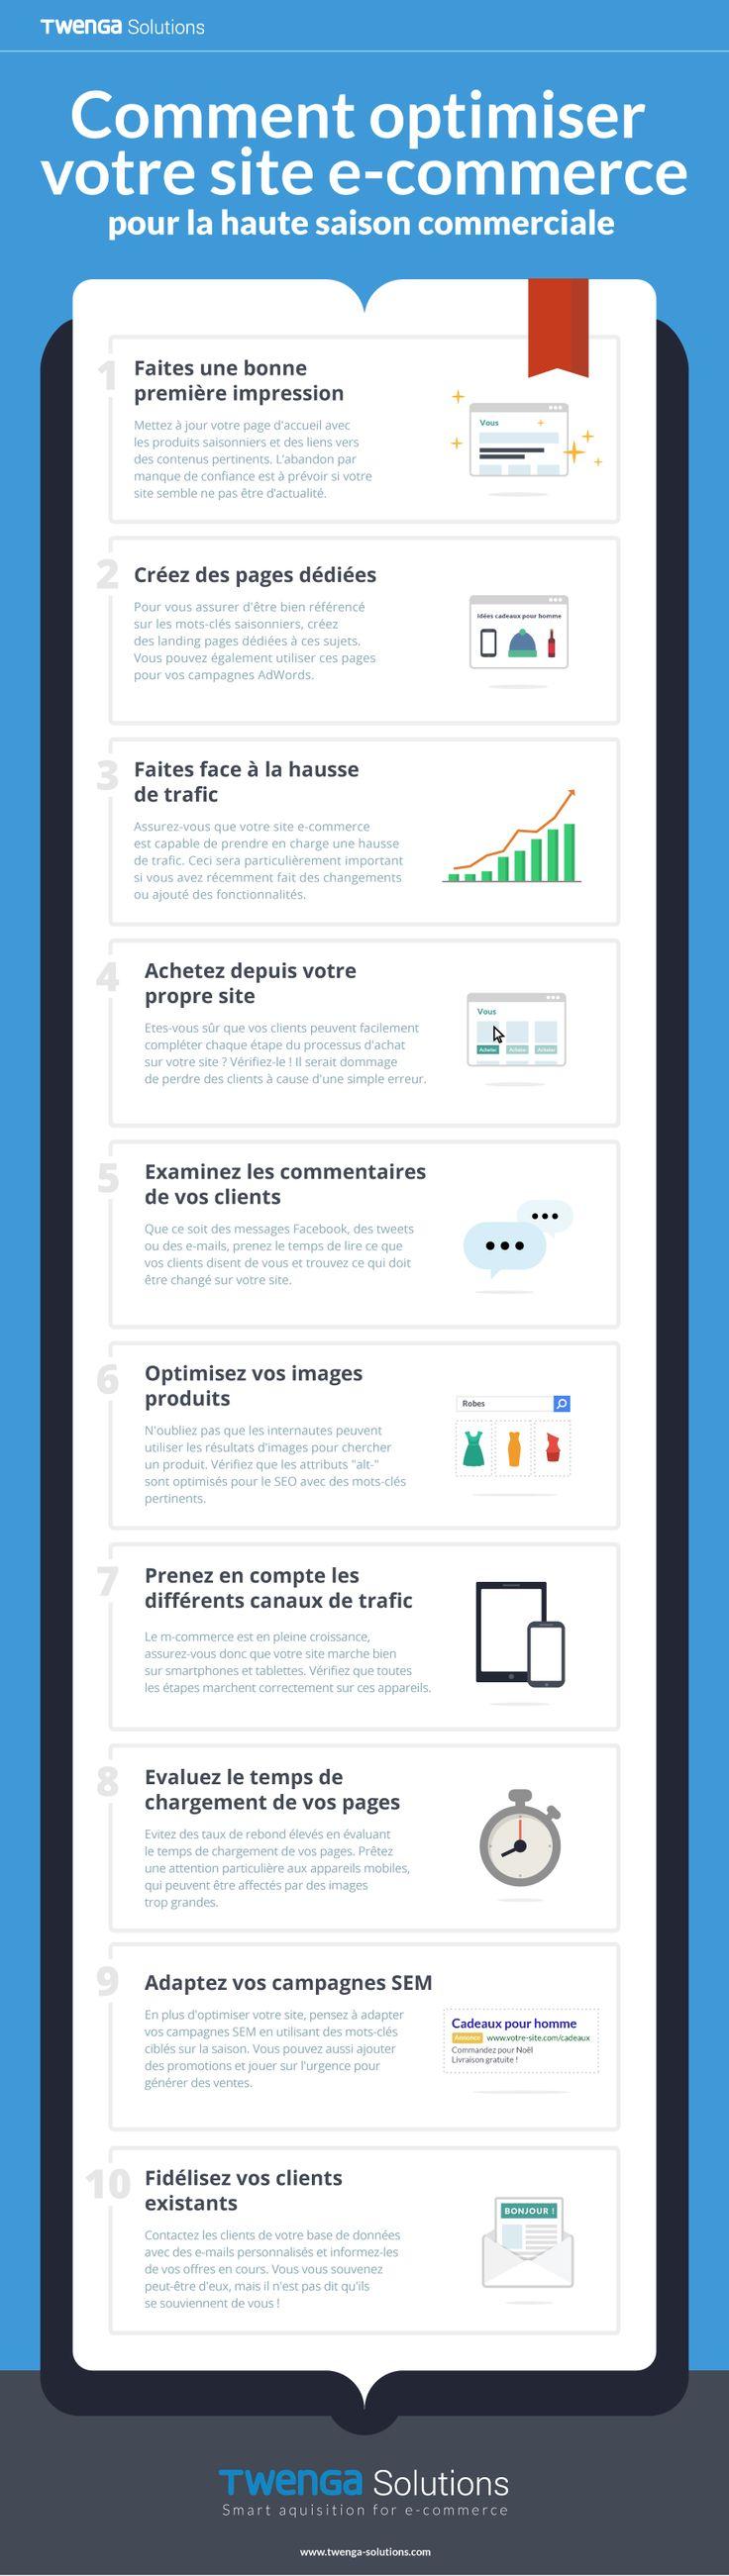 optimiser-site-ecommerce-infographie